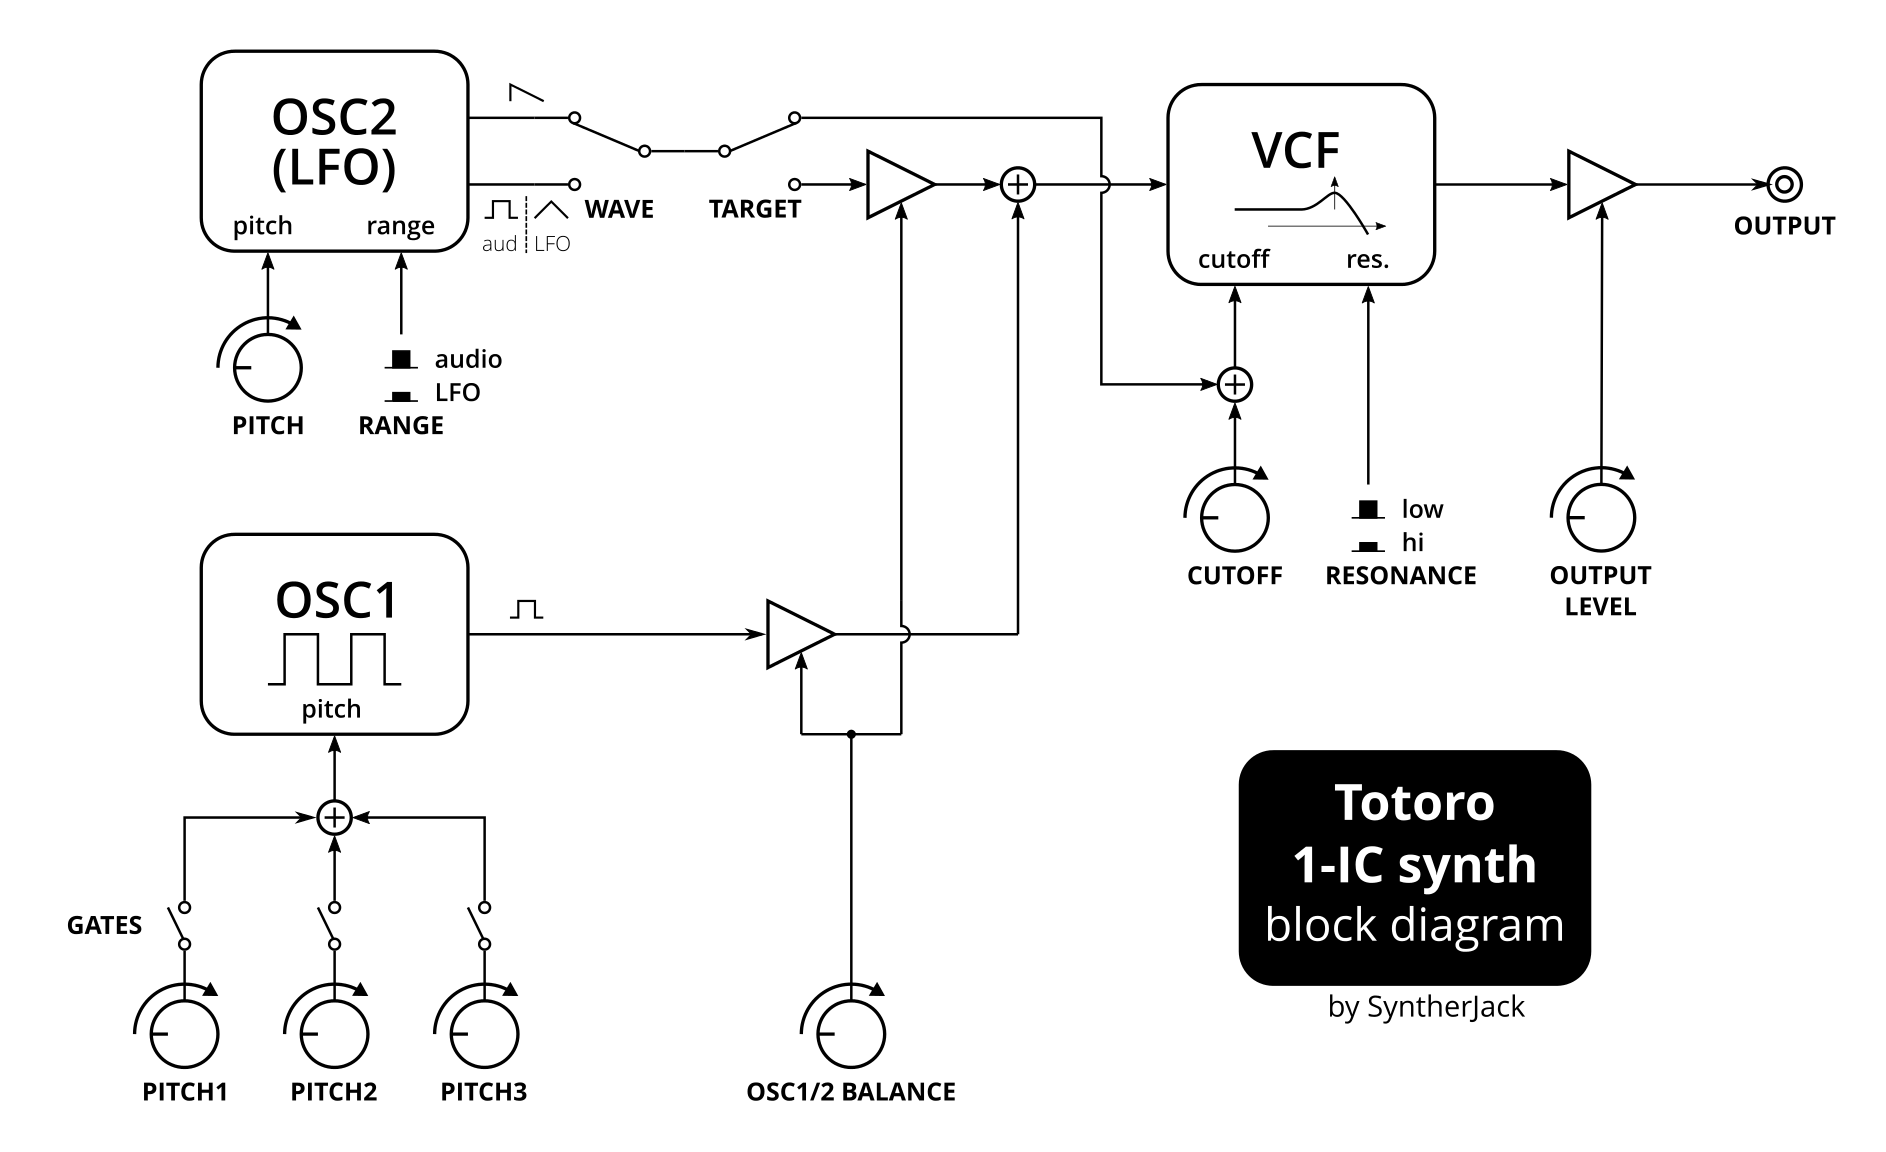 Totoro simple synth block diagram